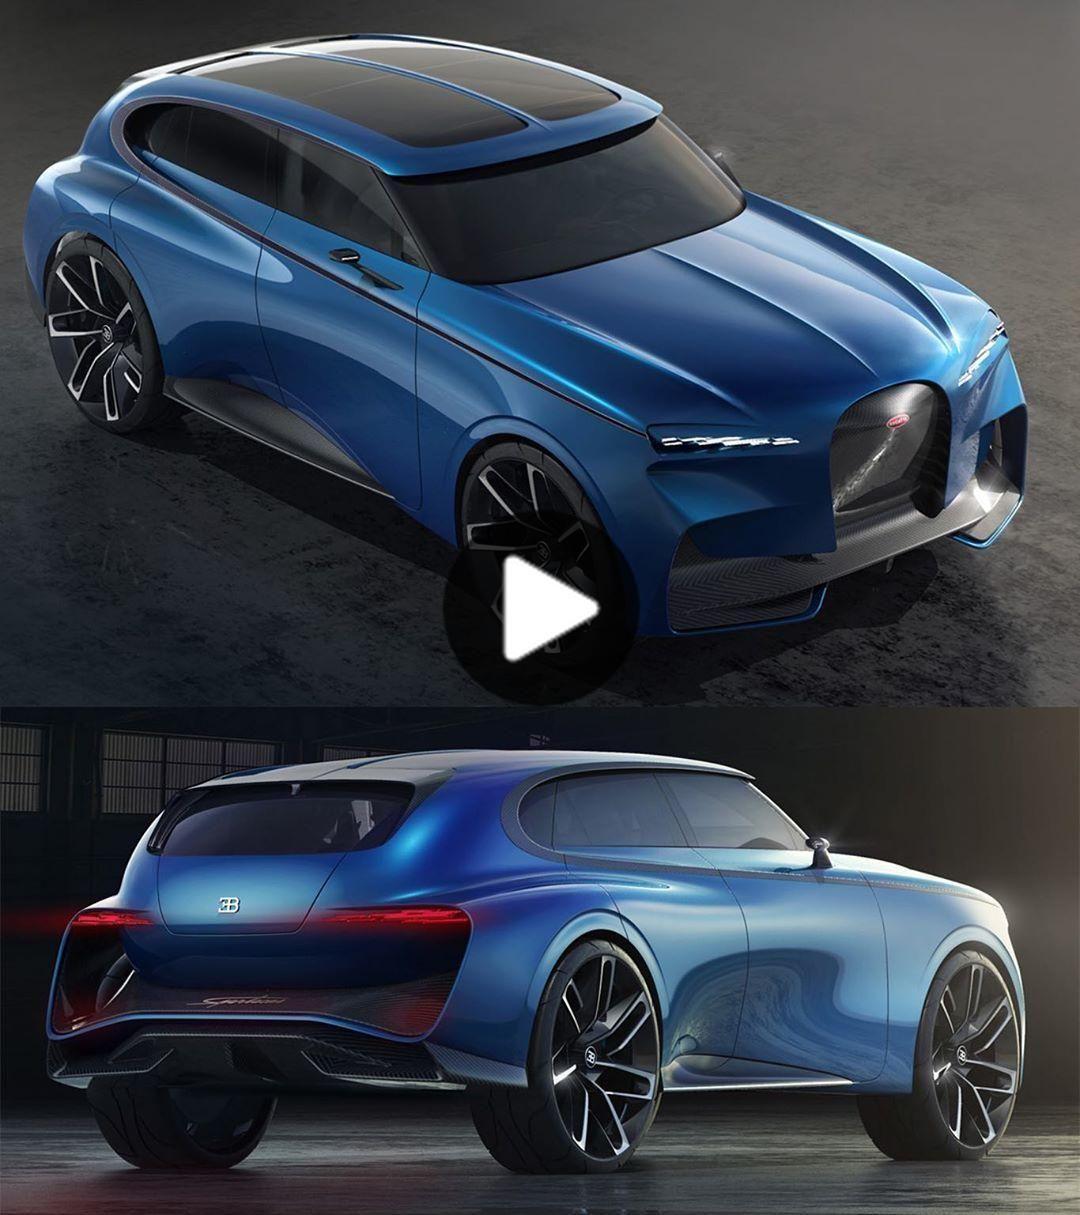 Cardesignworld Car Design Drive Luxury Car Luxury Car Tuning Cars For Future Concept Car Design In 2020 Car Toyota Concept Car Concept Cars Vintage